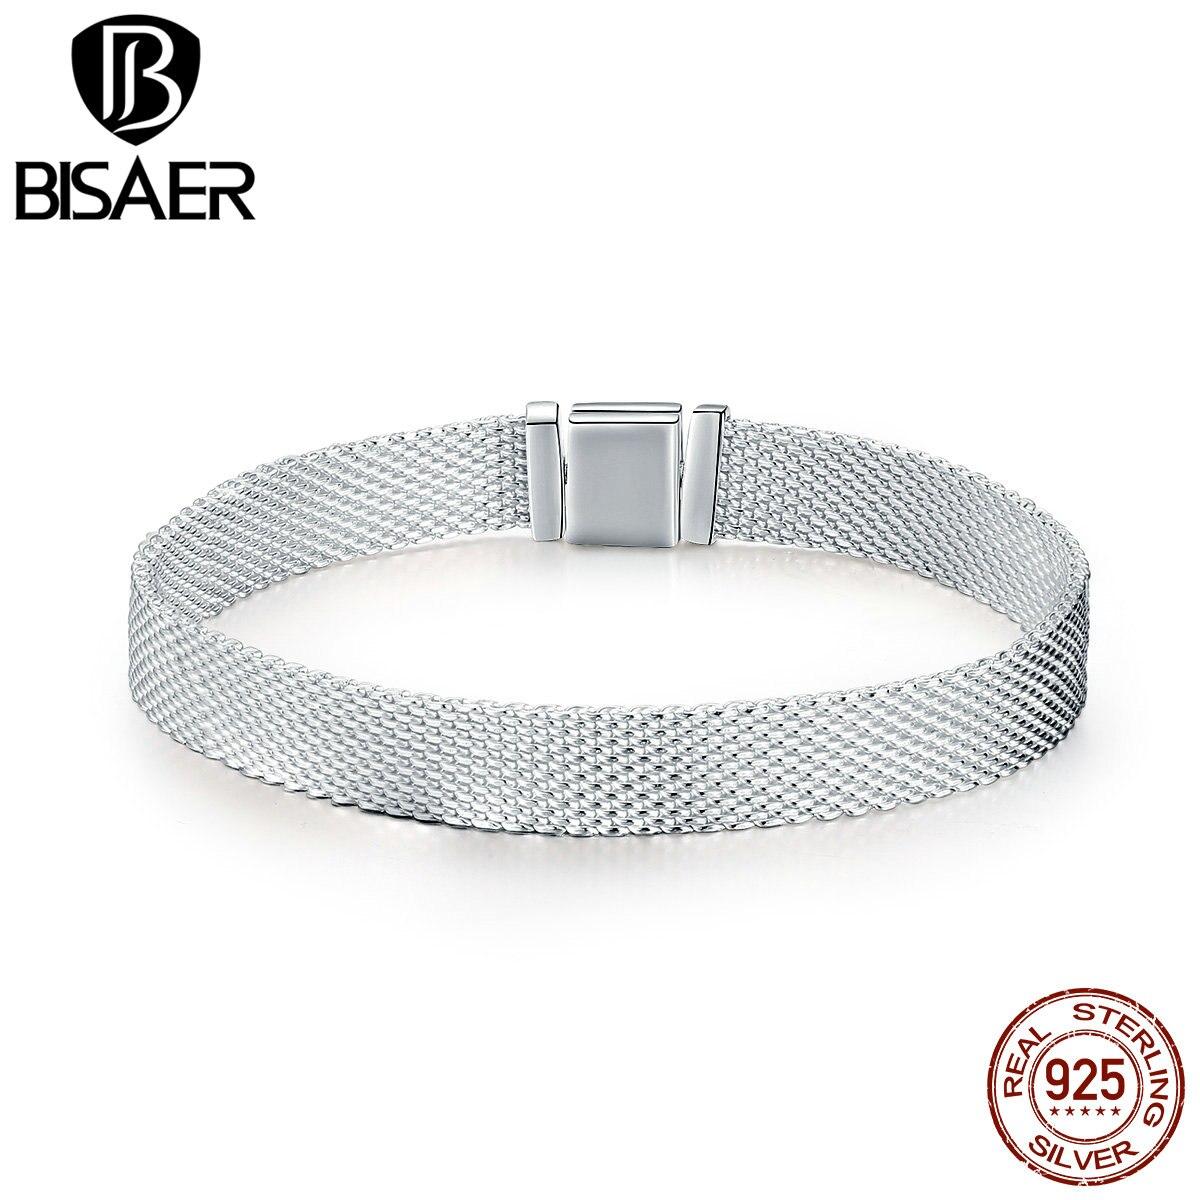 BISAER Hot Sale 925 Sterling Silver Simple Women Beads Strand Bracelets Hot Sale Bracelets Jewelry Pulseira 17CM 19CM ECX001